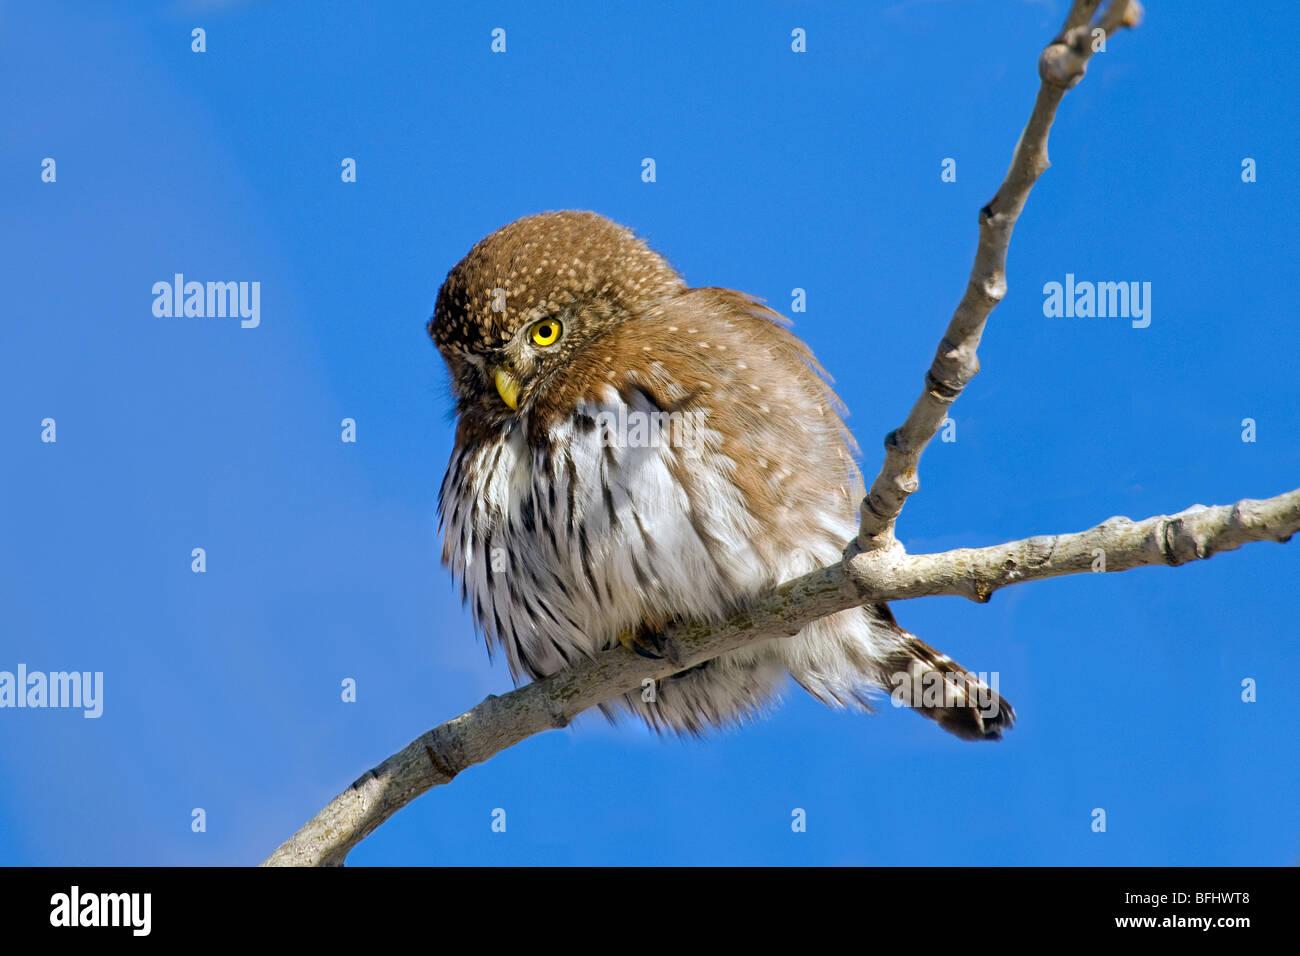 Northern pygmy-owl (Glaucidium gnoma) hunting in southern Alberta, Canada - Stock Image